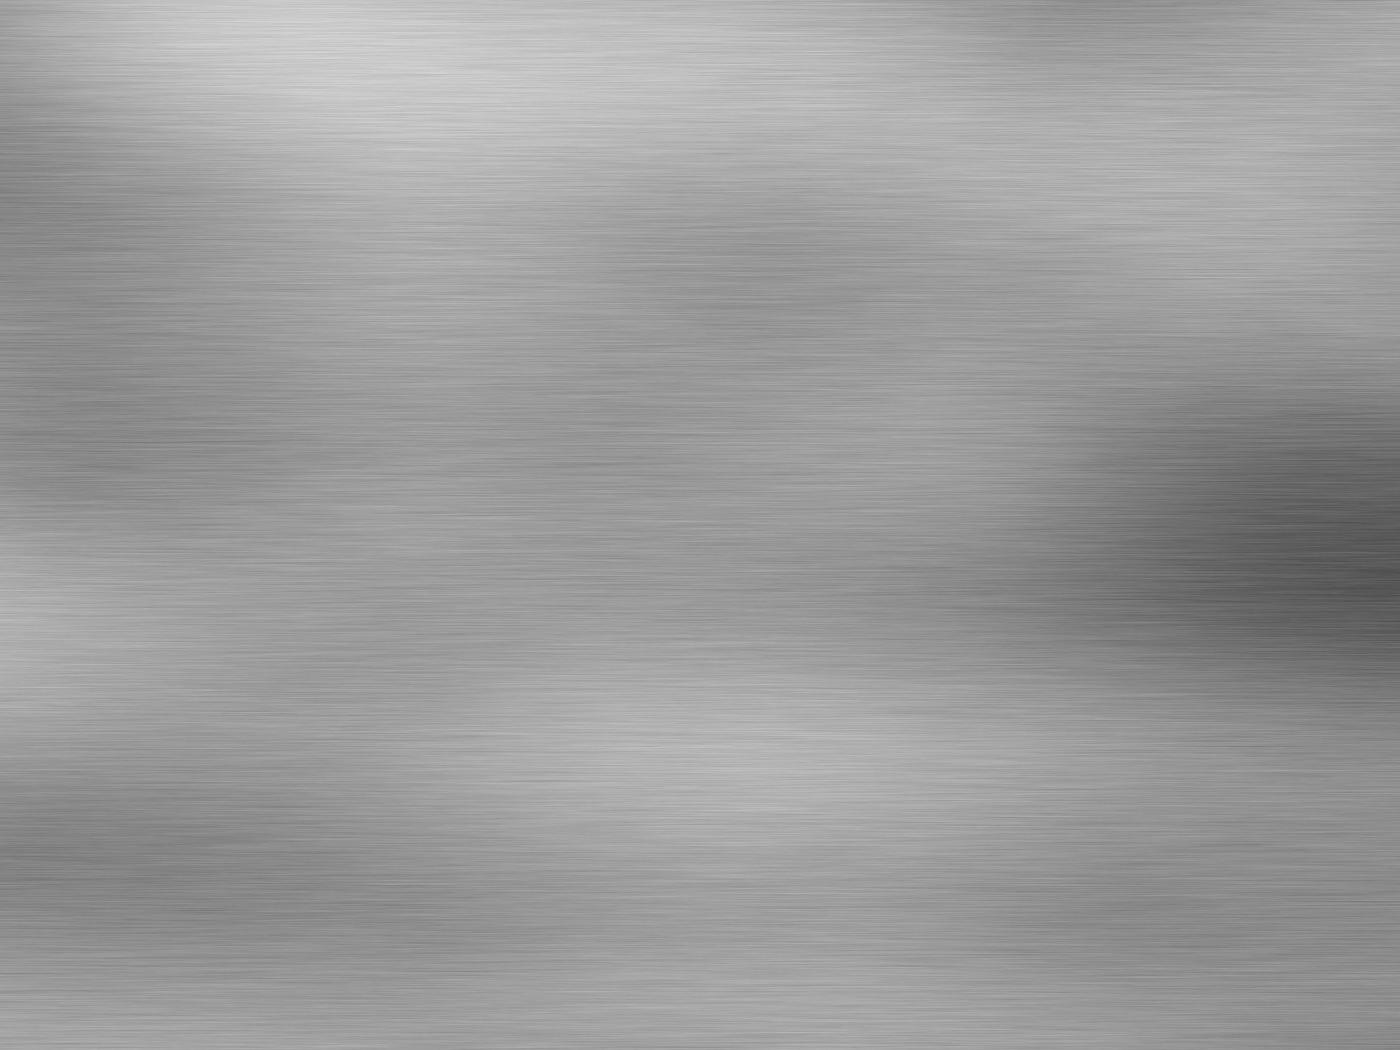 Brushed Metal Background 1400x1050